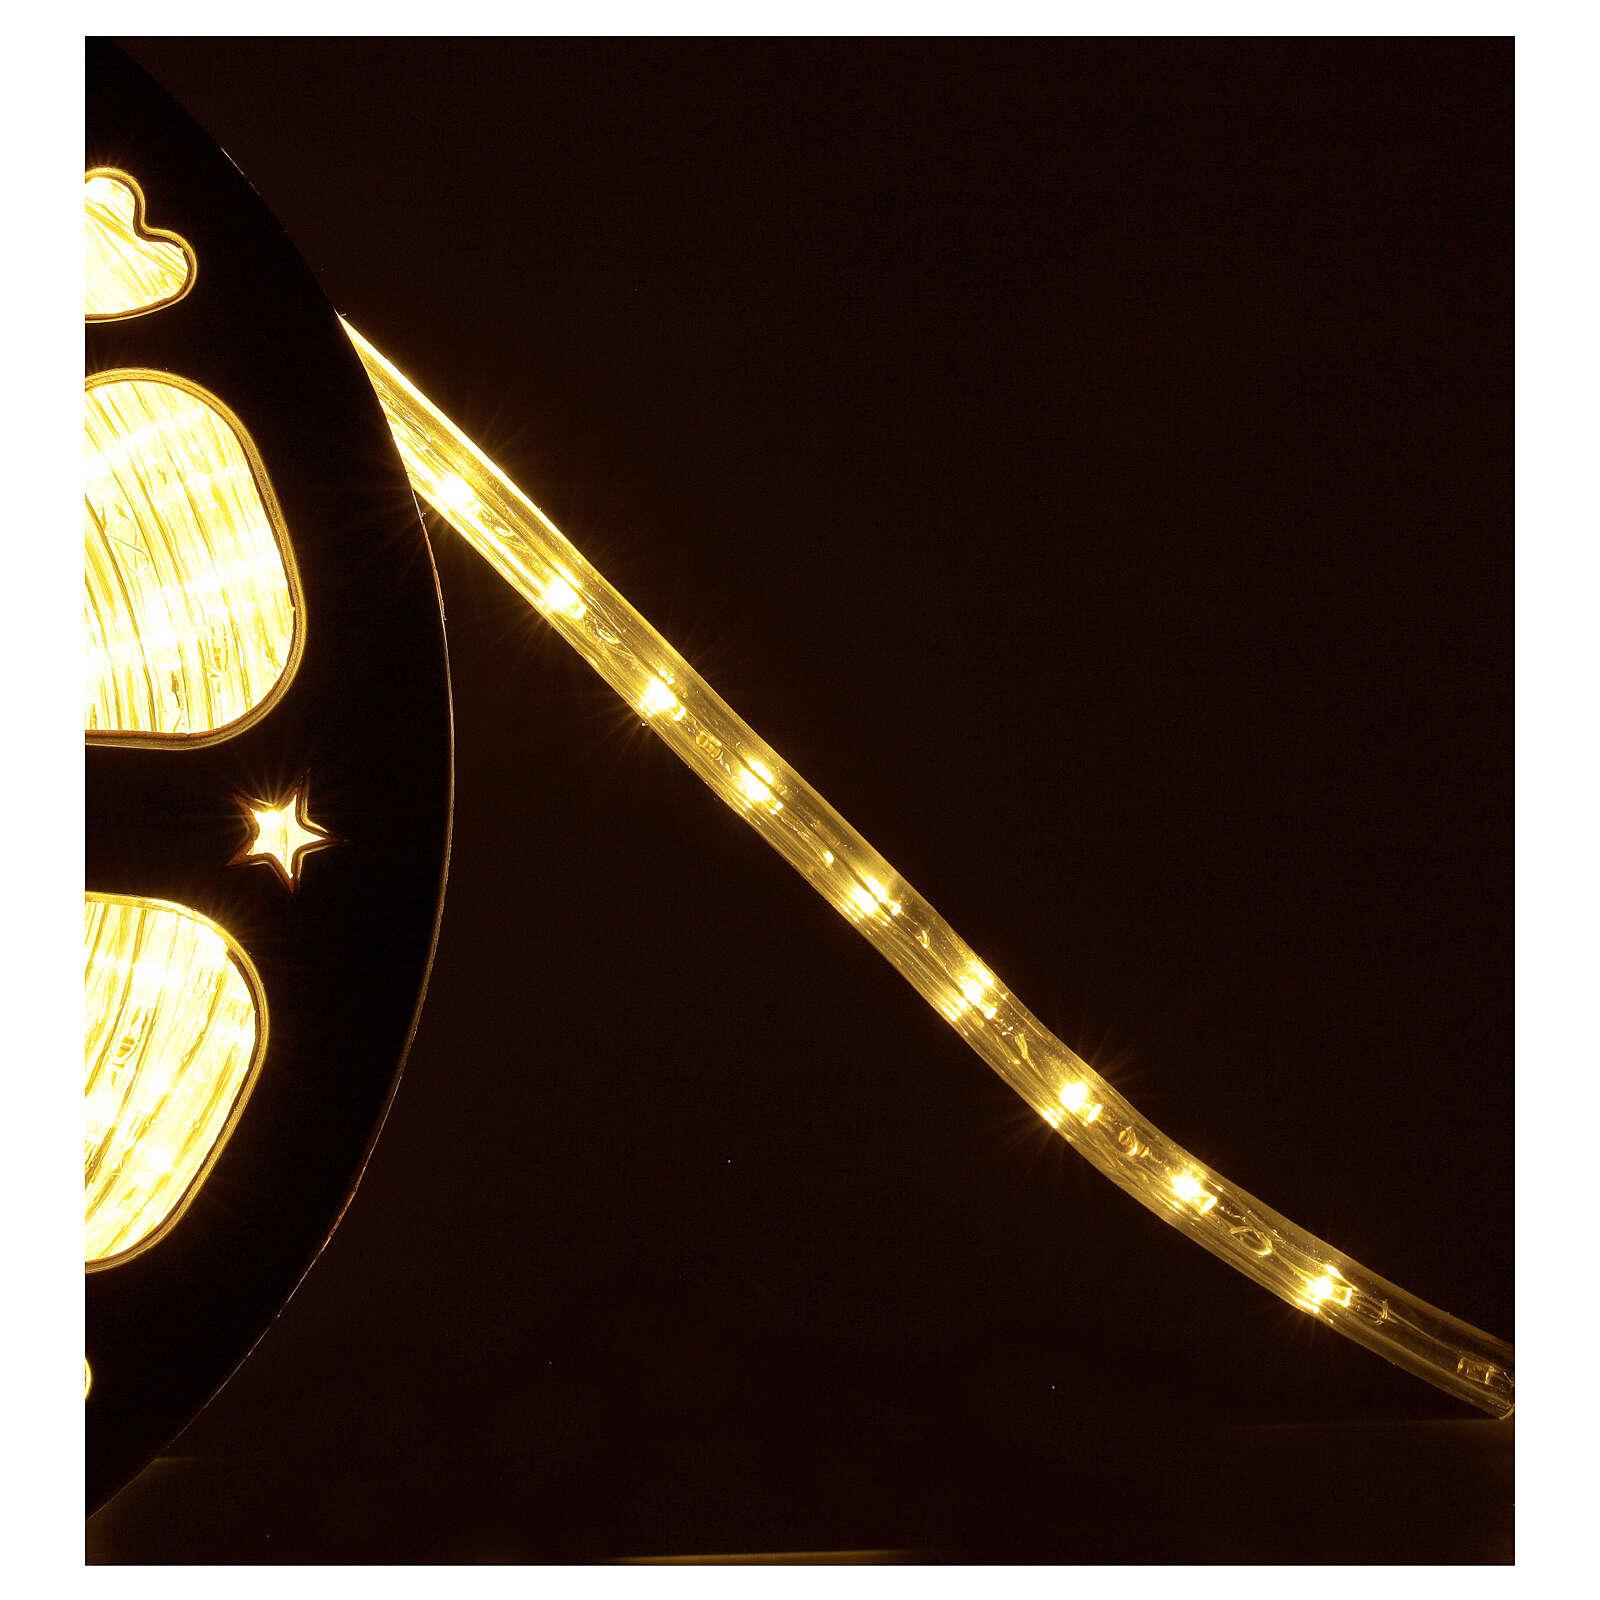 Bobina tubo 1584 led blanco cálido 2 hilos luces Navidad 44 m int ext 3